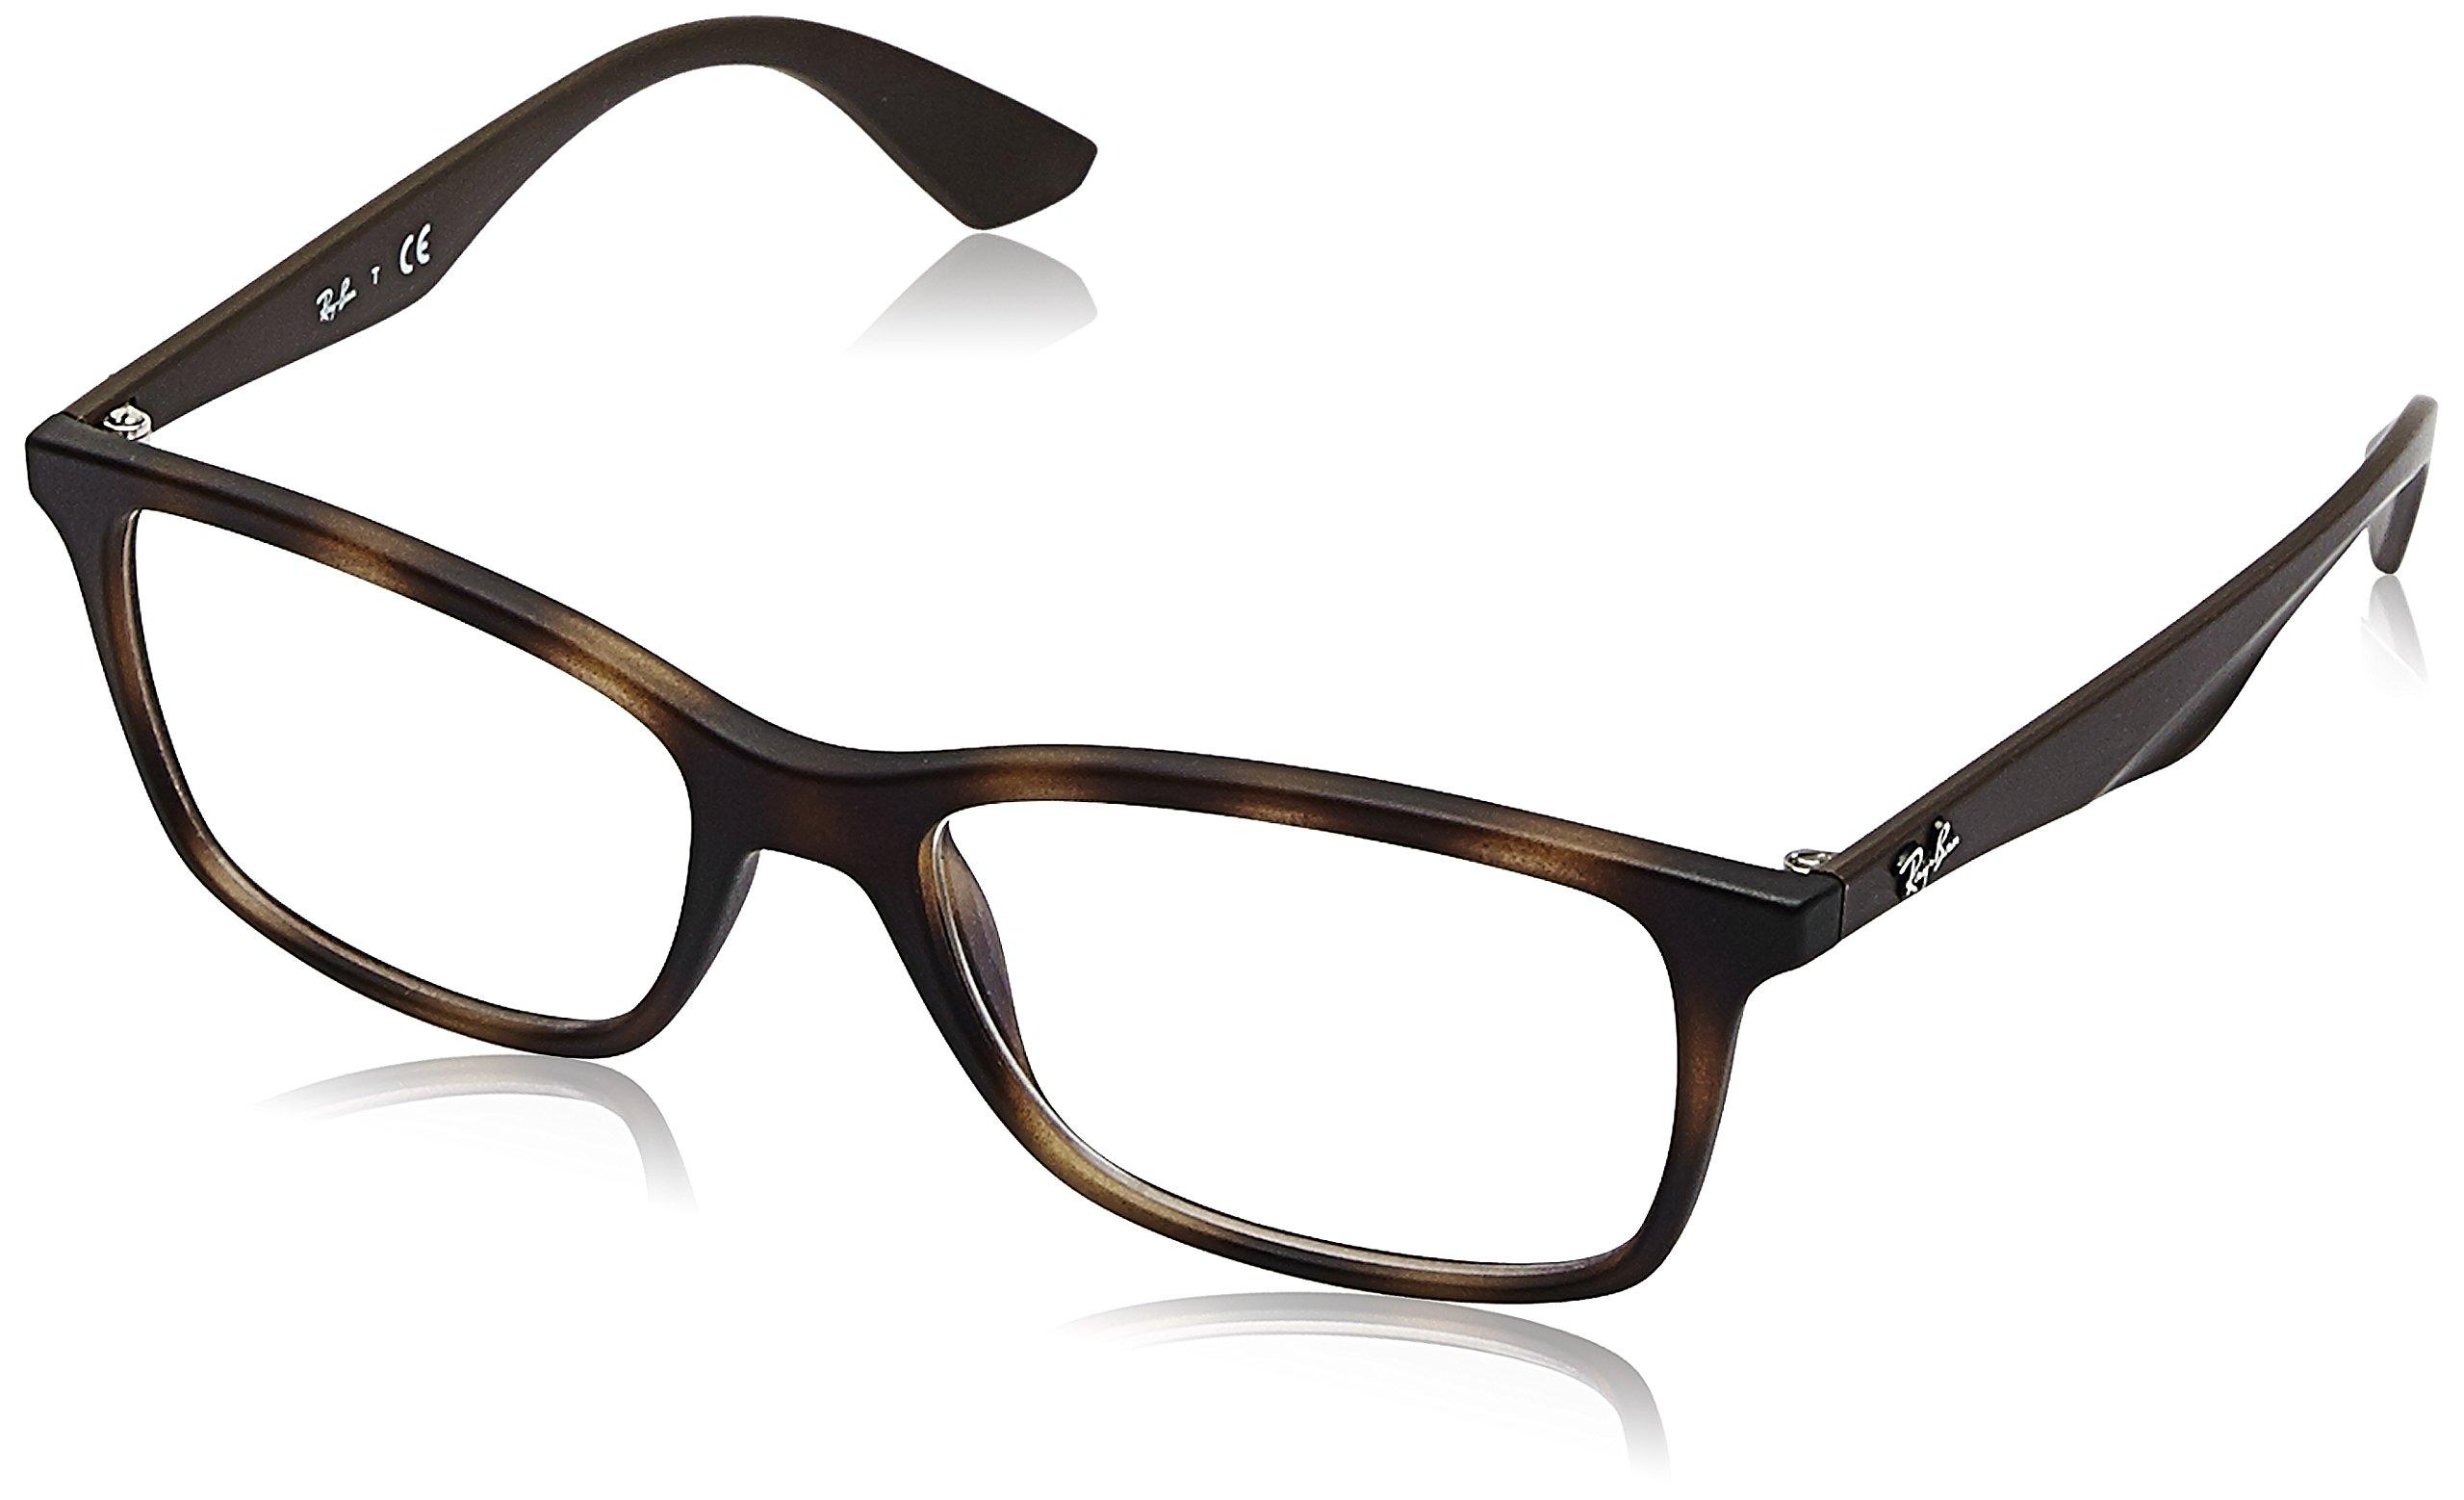 RAY-BAN RX7047 Rectangular Eyeglass Frames, Matte Havana/Demo Lens, 56 mm by Ray-Ban